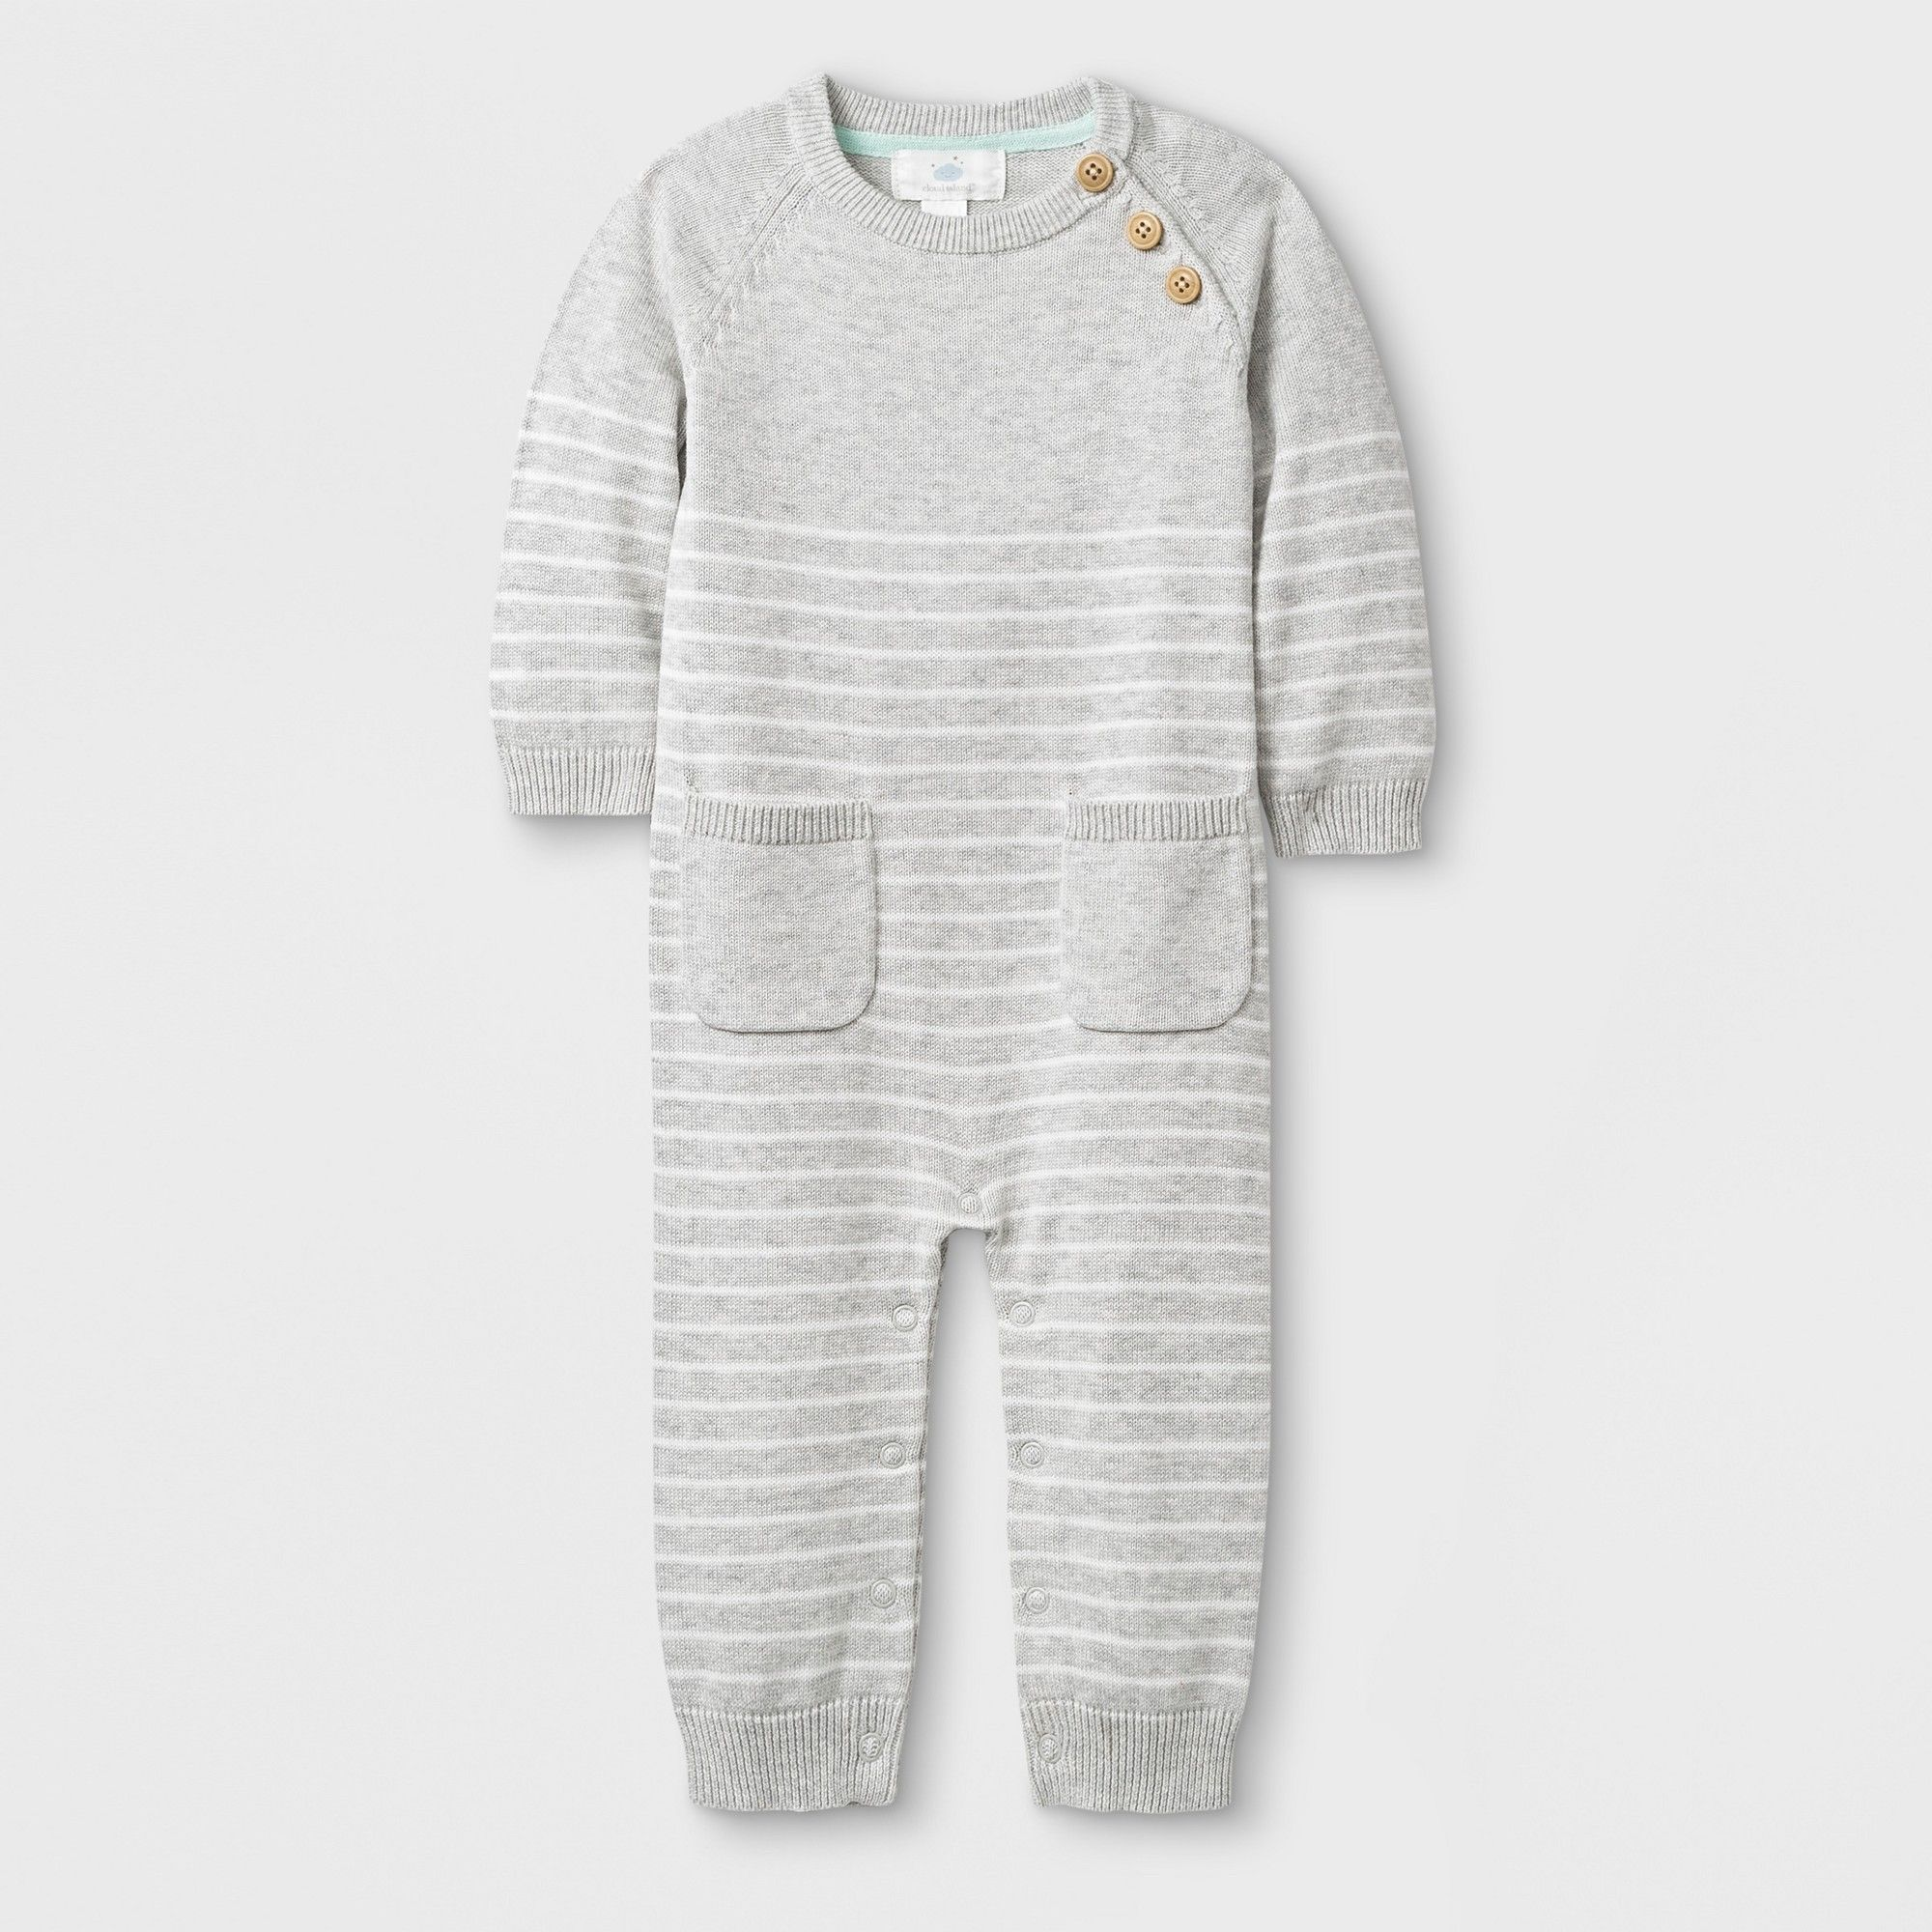 207cc66c26f Baby Long Sleeve Romper - Cloud Island Gray Newborn